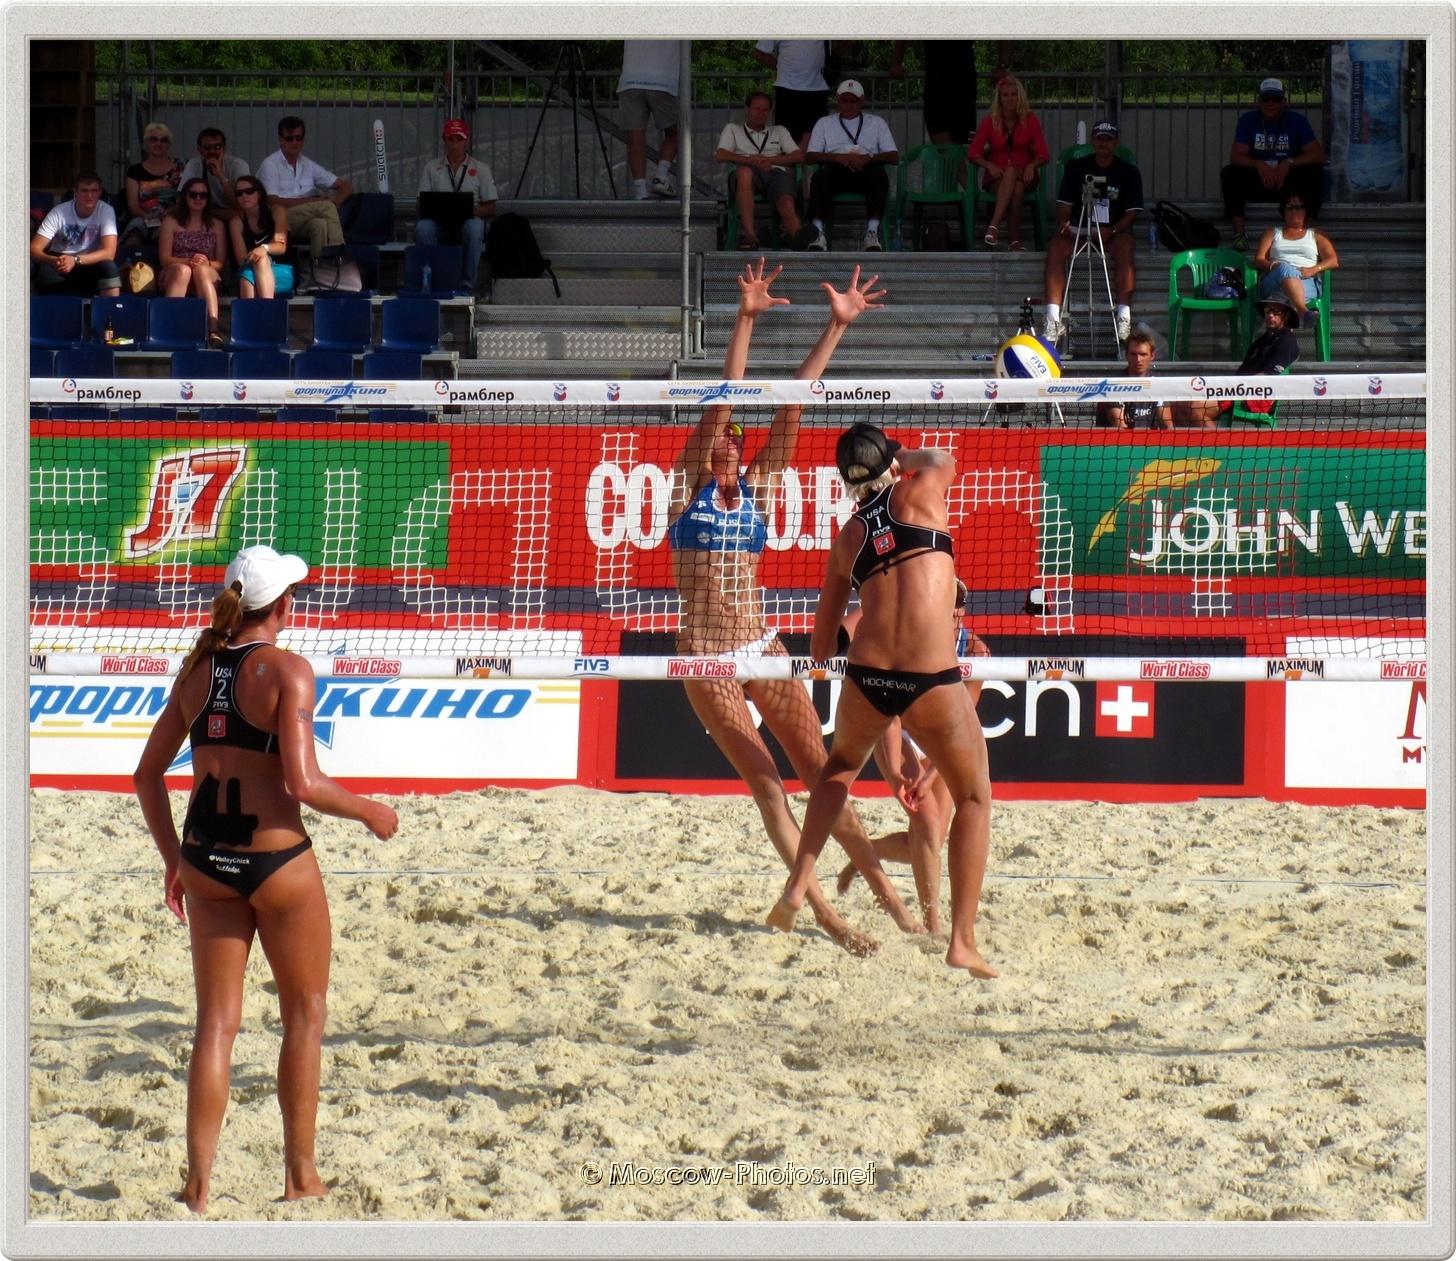 Brittany Hochevar & Lisa Rutledge vs Ekaterina Birlova (Khomyakova) & Evgenia Ukolova